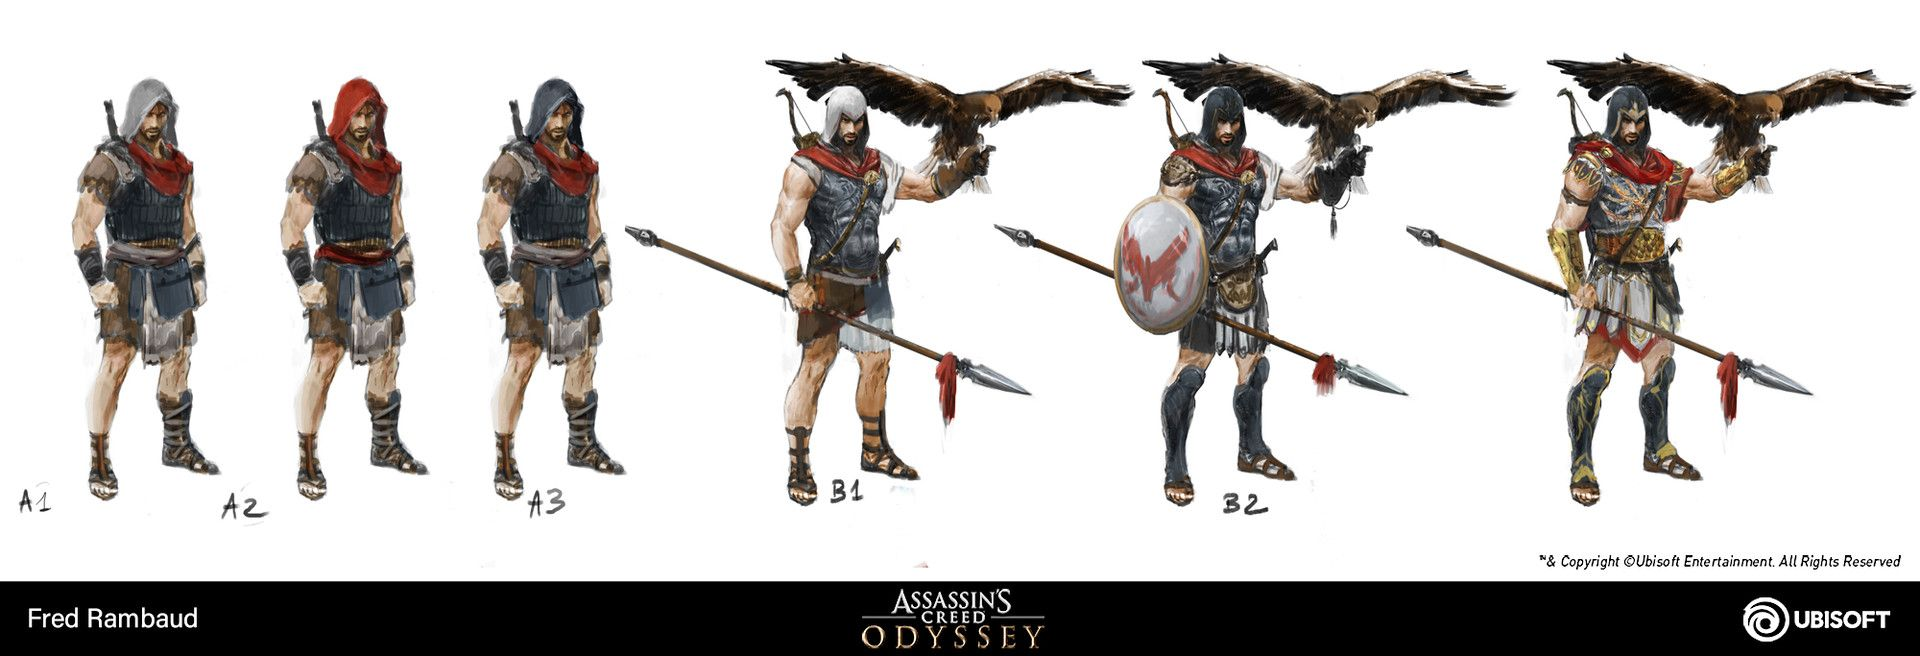 assassins creed odyssey alexios concept art